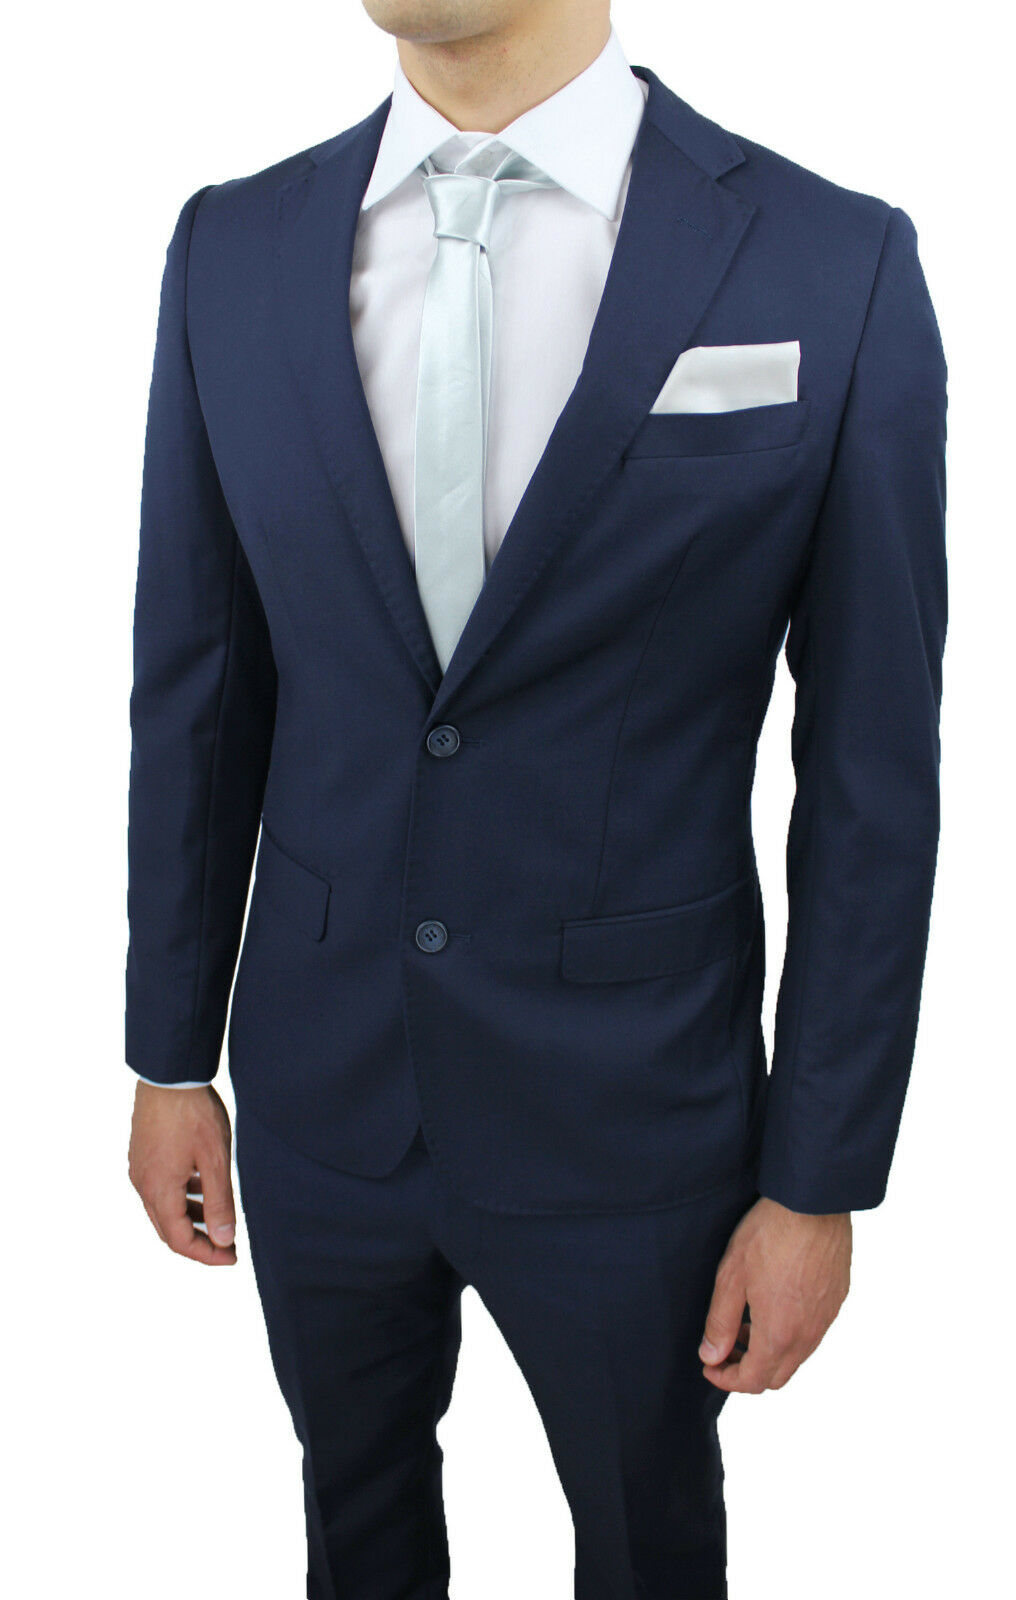 Abito Matrimonio Uomo Blu Scuro : Elegante abito uomo sartoriale blu slim fit aderente